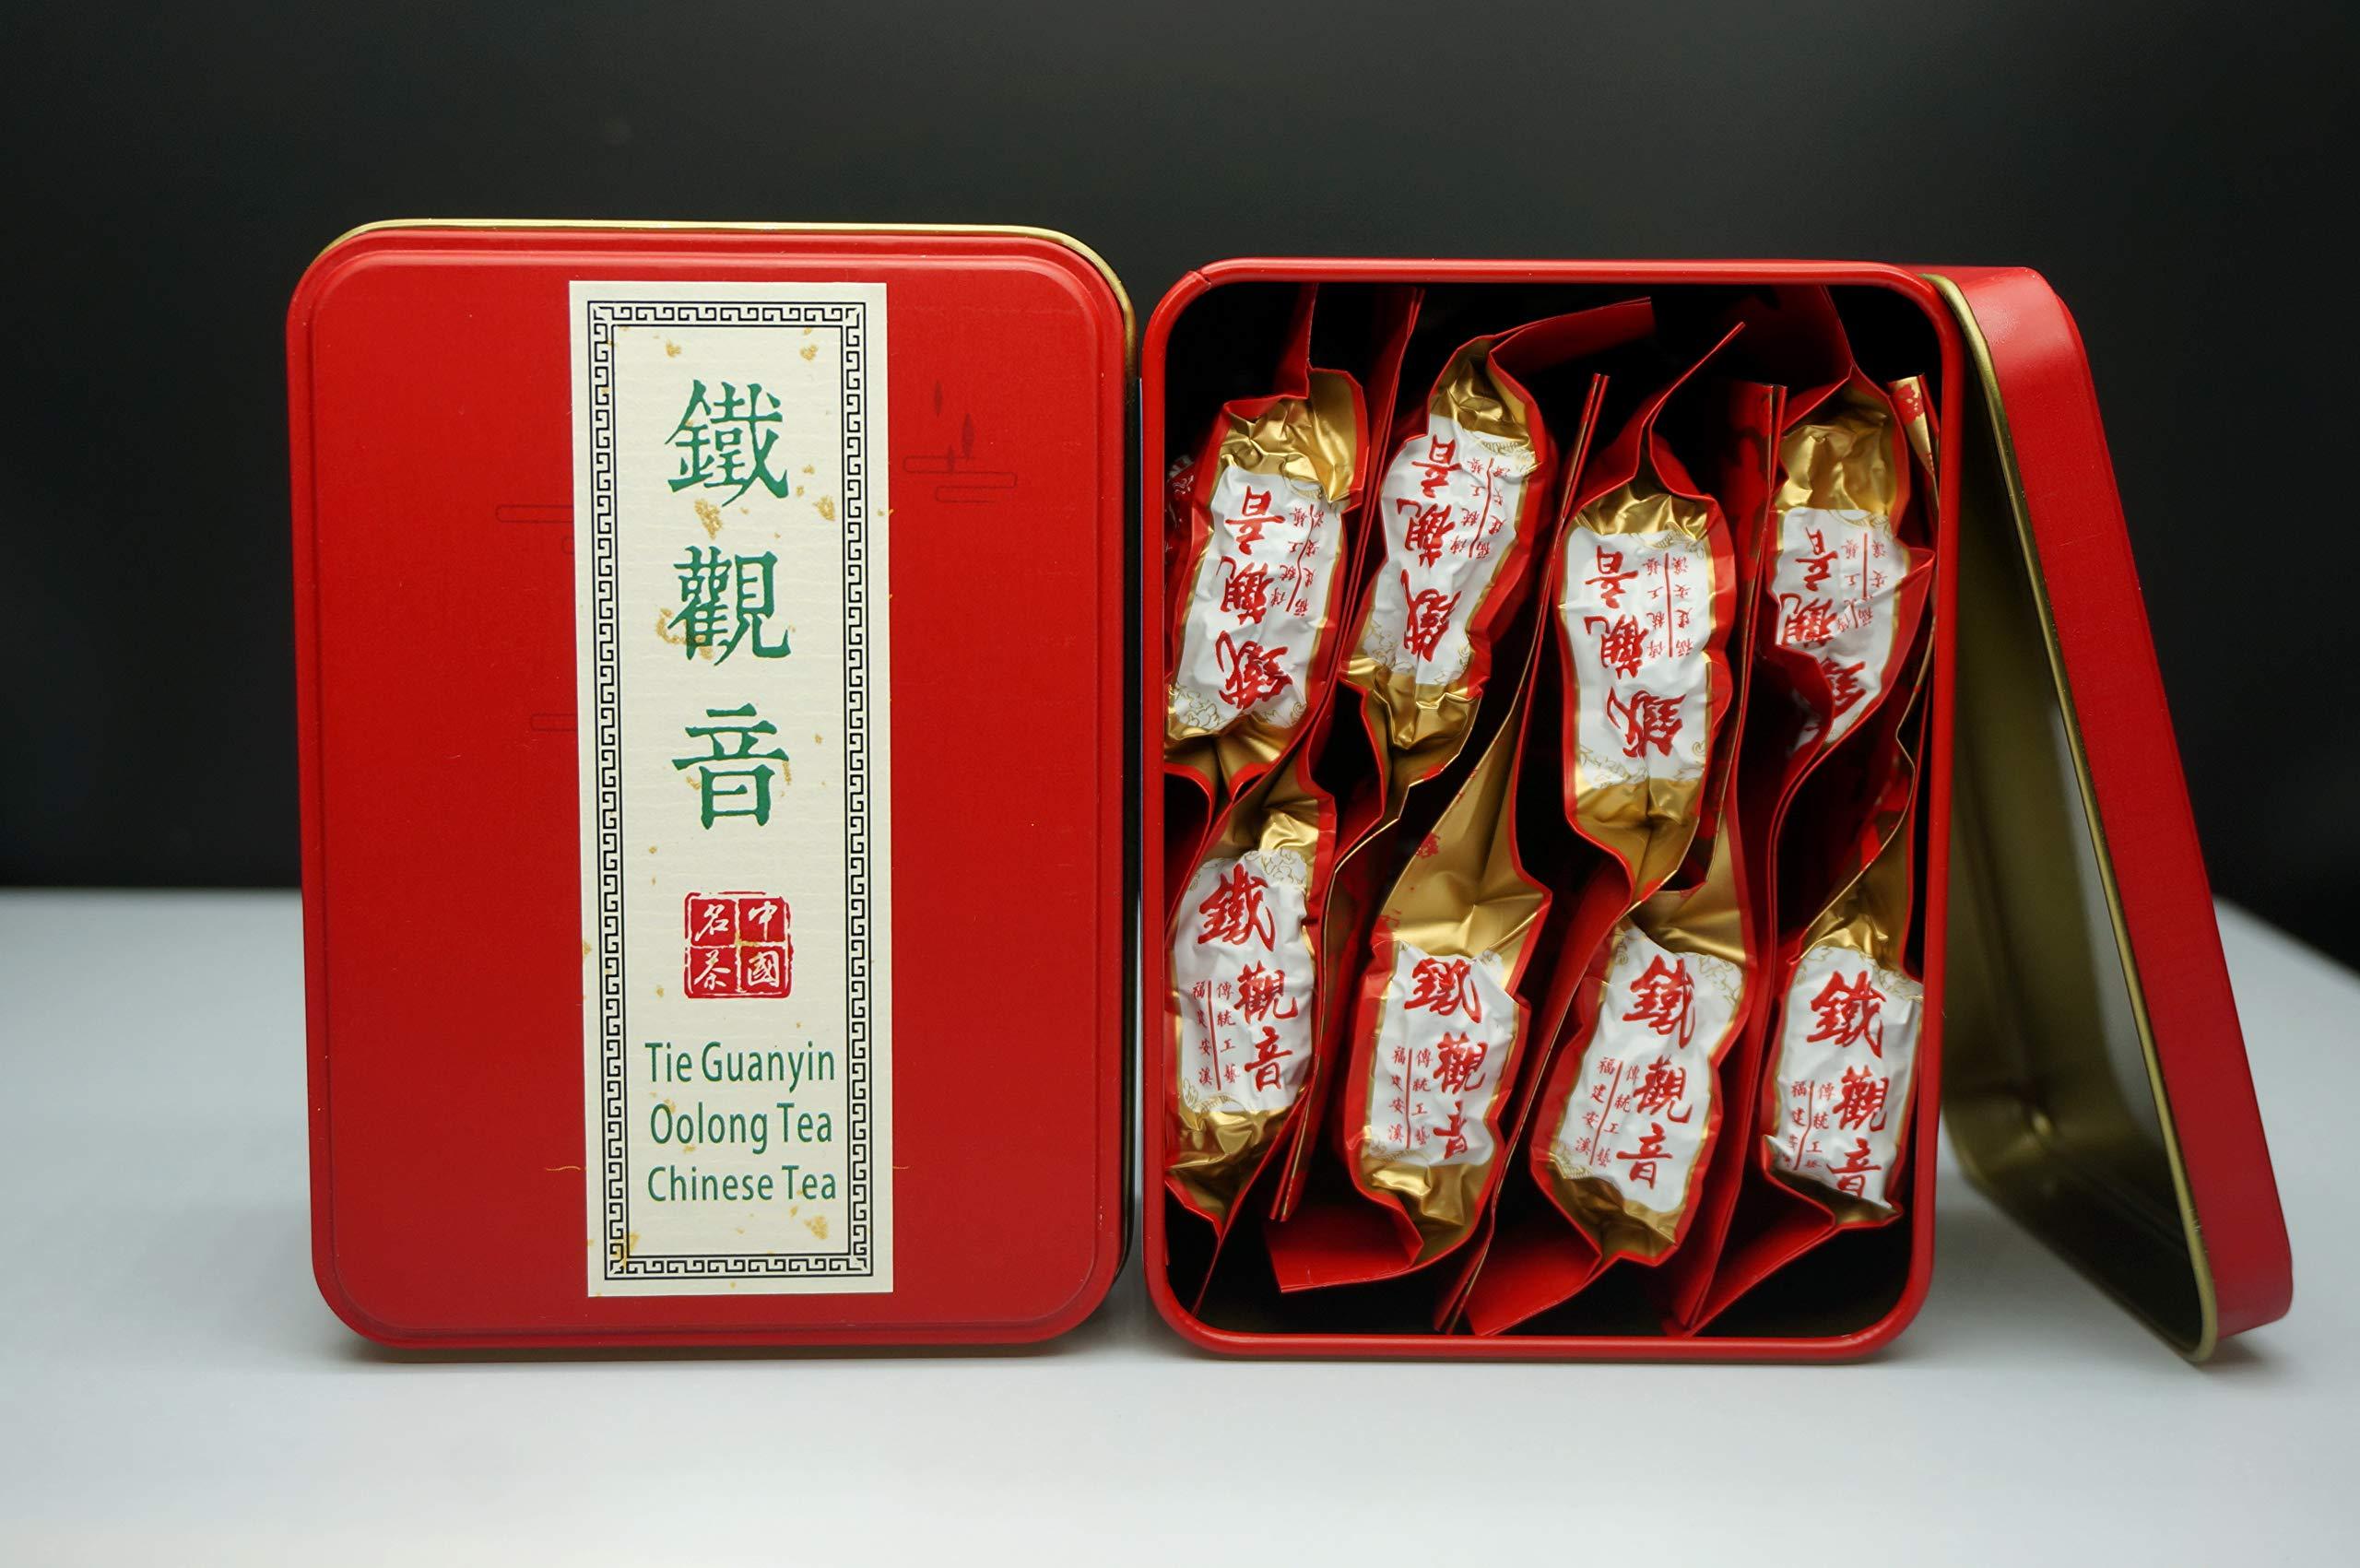 Tie GuanYin.Tieguanyin Tea.Oolong Tea.Chinese Tea.Green Tea.Anxi Oolong Tea.Tie GuanYin Oolong Tea.Tea Box.铁观音.乌龙茶.茶叶.